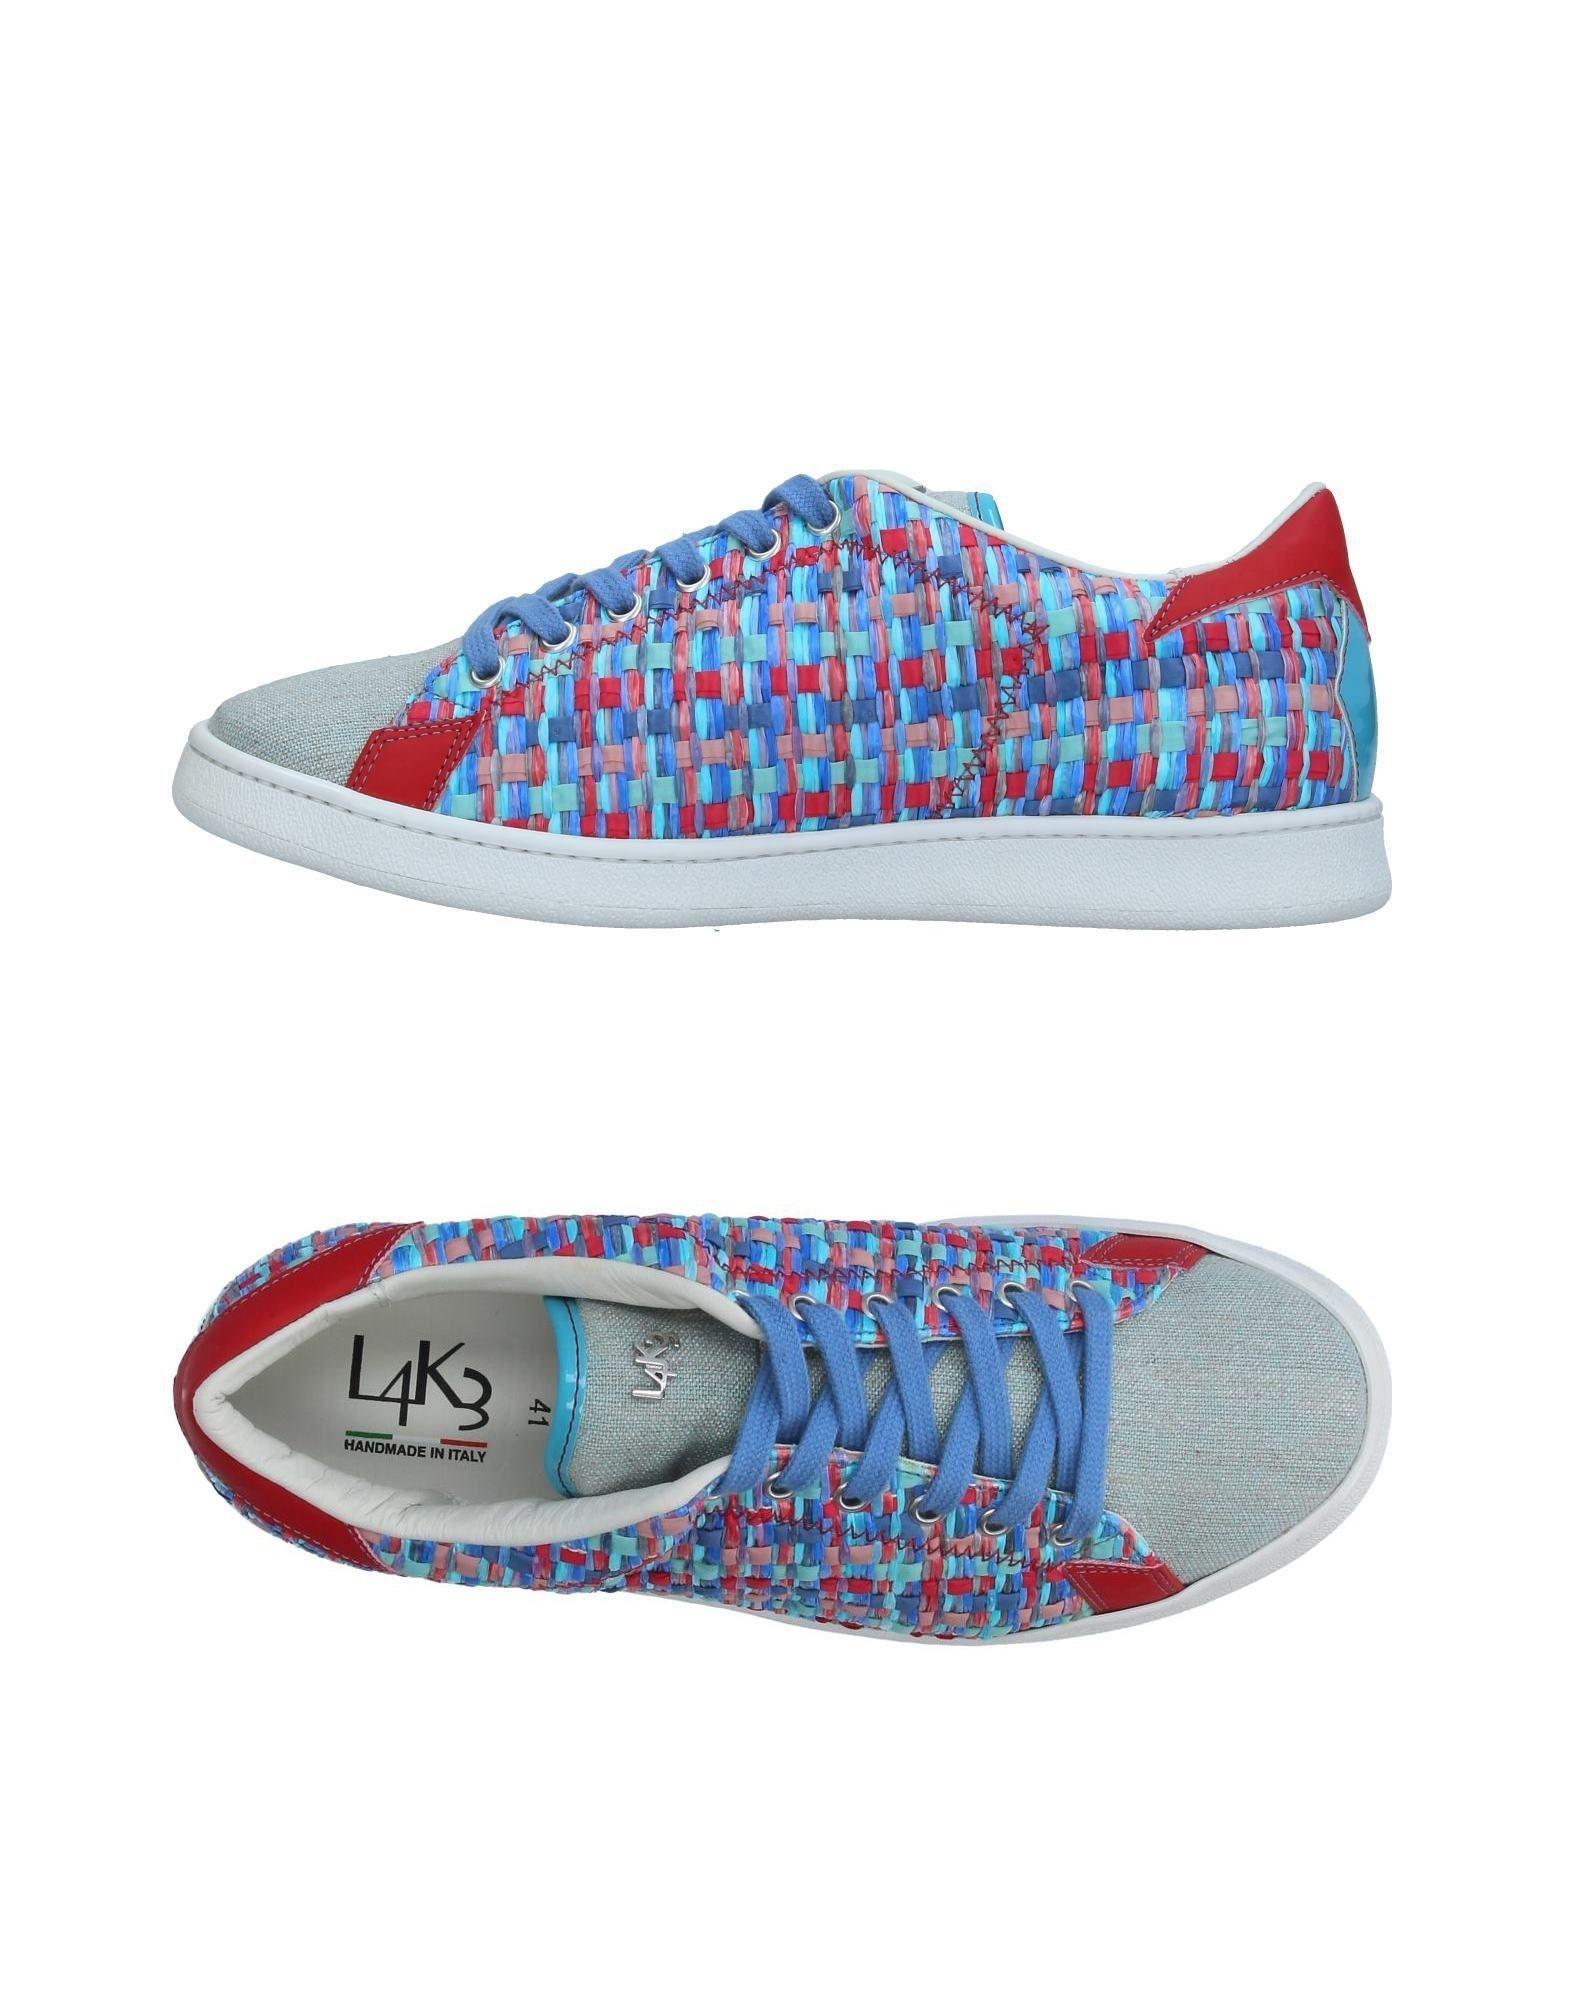 FOOTWEAR - Low-tops & sneakers L4K3 0VNY0hPSc